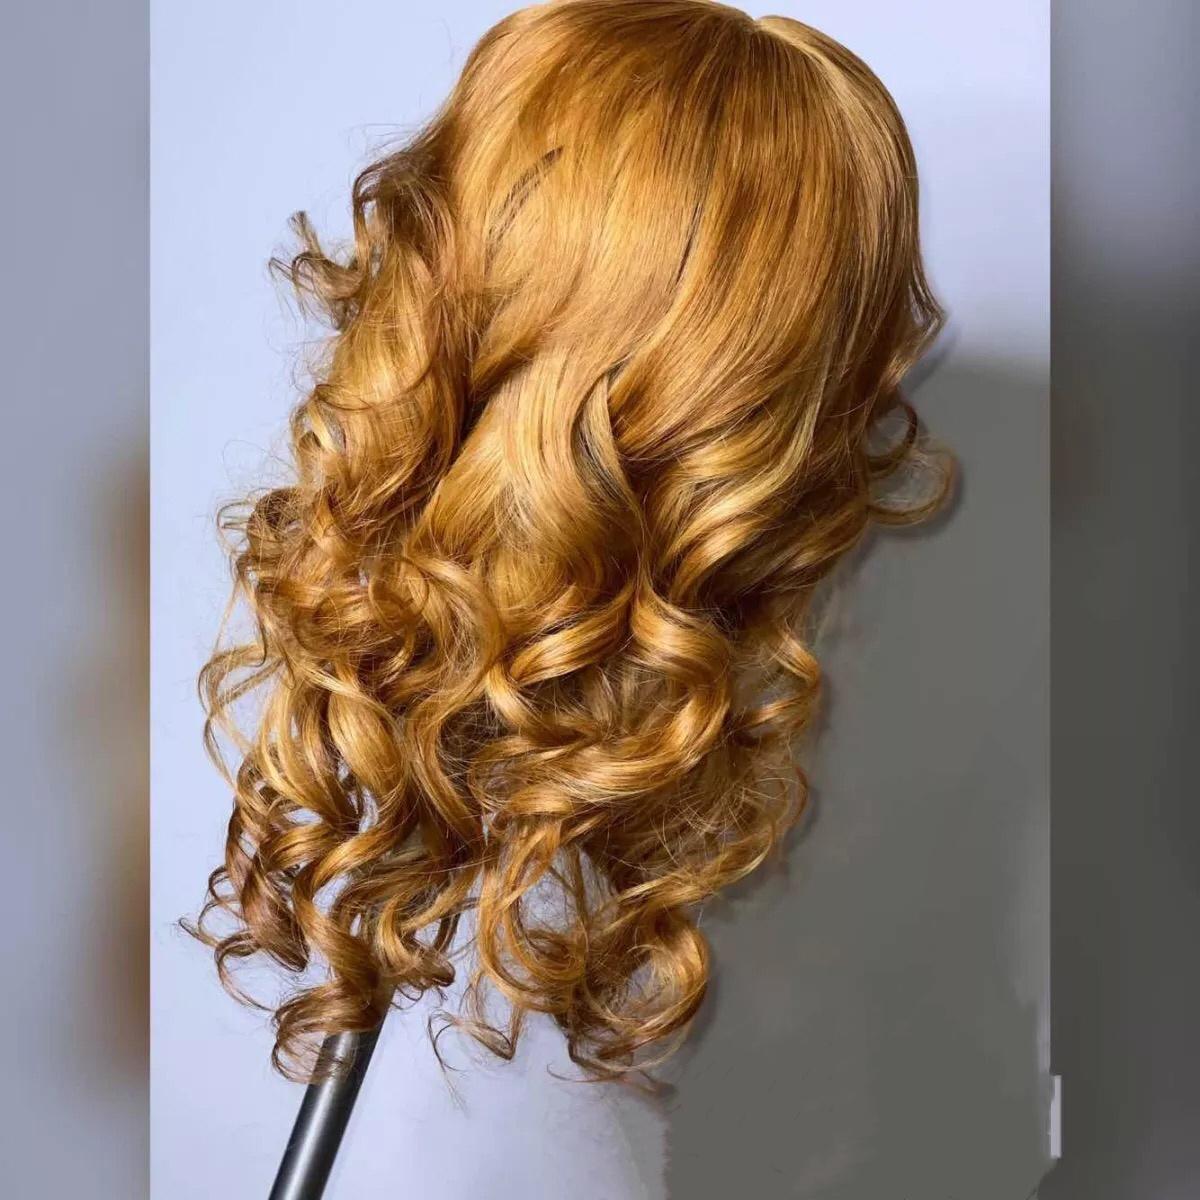 KBL 100% unprocessed brazilian virgin hair wholesale loose wave bundles